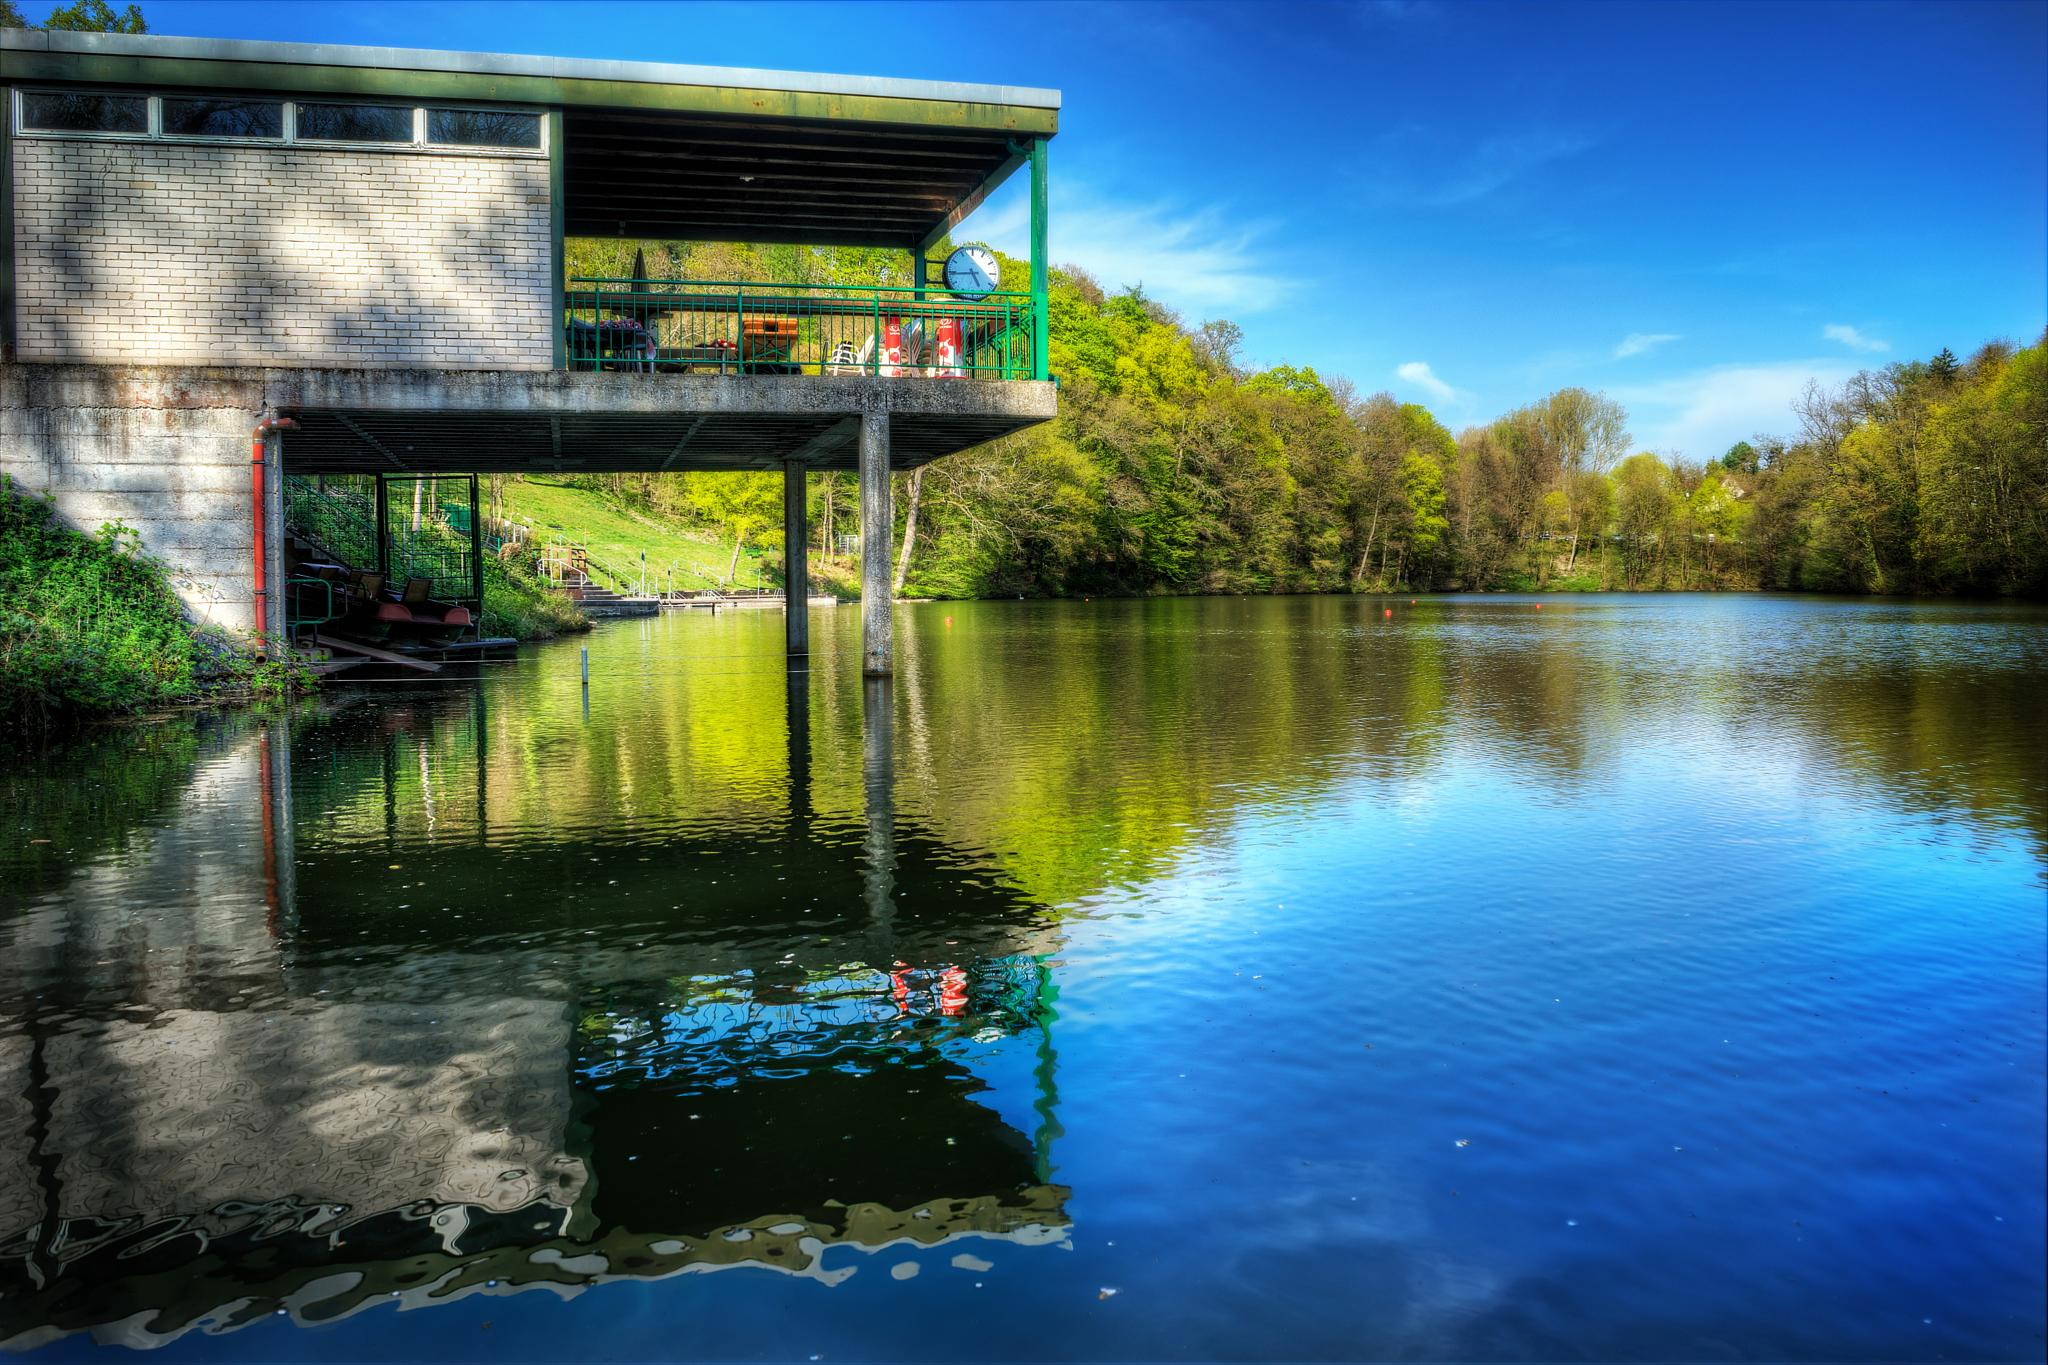 Tiefer See by Oliver Penack